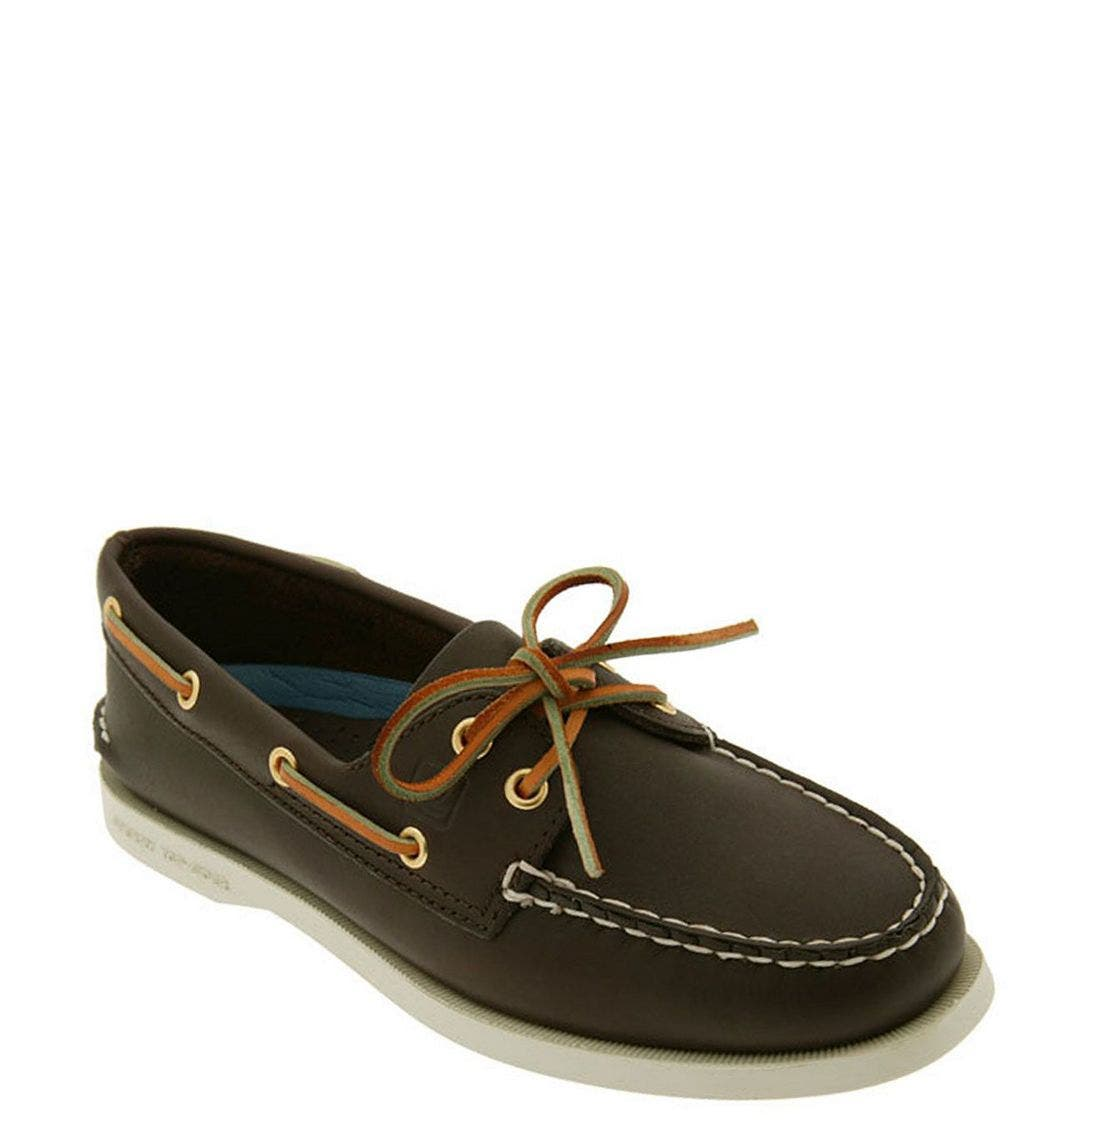 'Authentic Original' Boat Shoe,                         Main,                         color, Brown